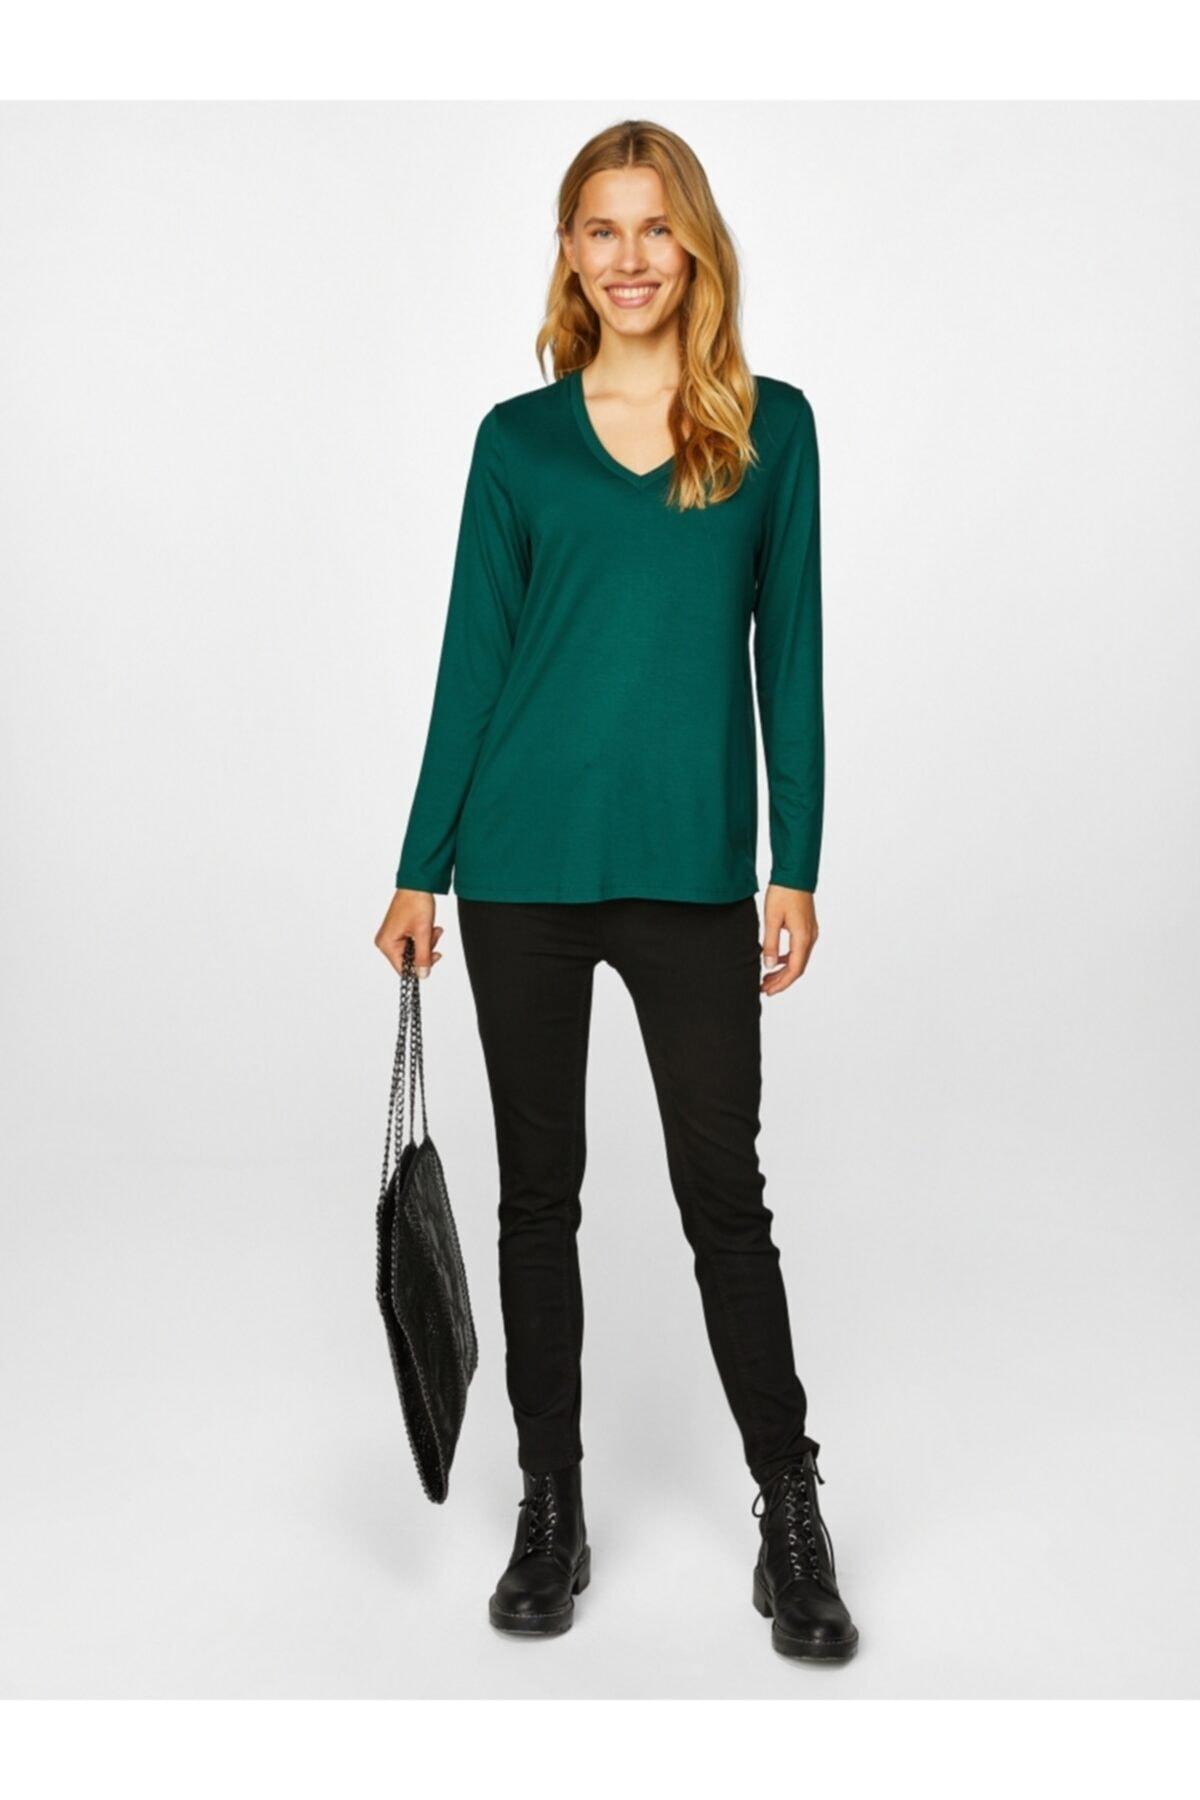 Faik Sönmez Kadın V Yaka Uzun Kol T-shirt 61022 2